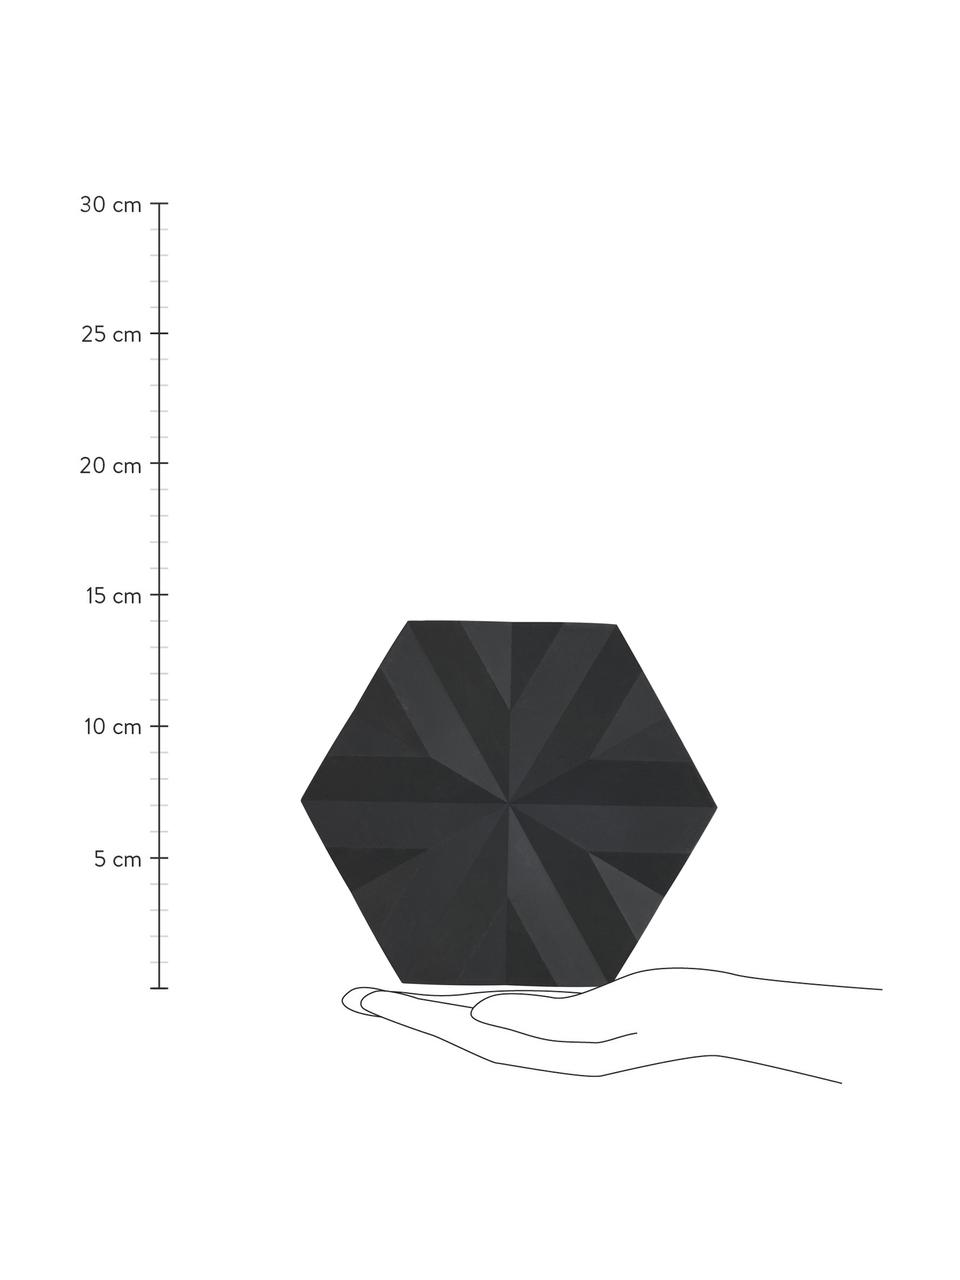 Topfuntersetzer Ori in Schwarz, 2 Stück, Silikon, Schwarz, 14 x 16 cm